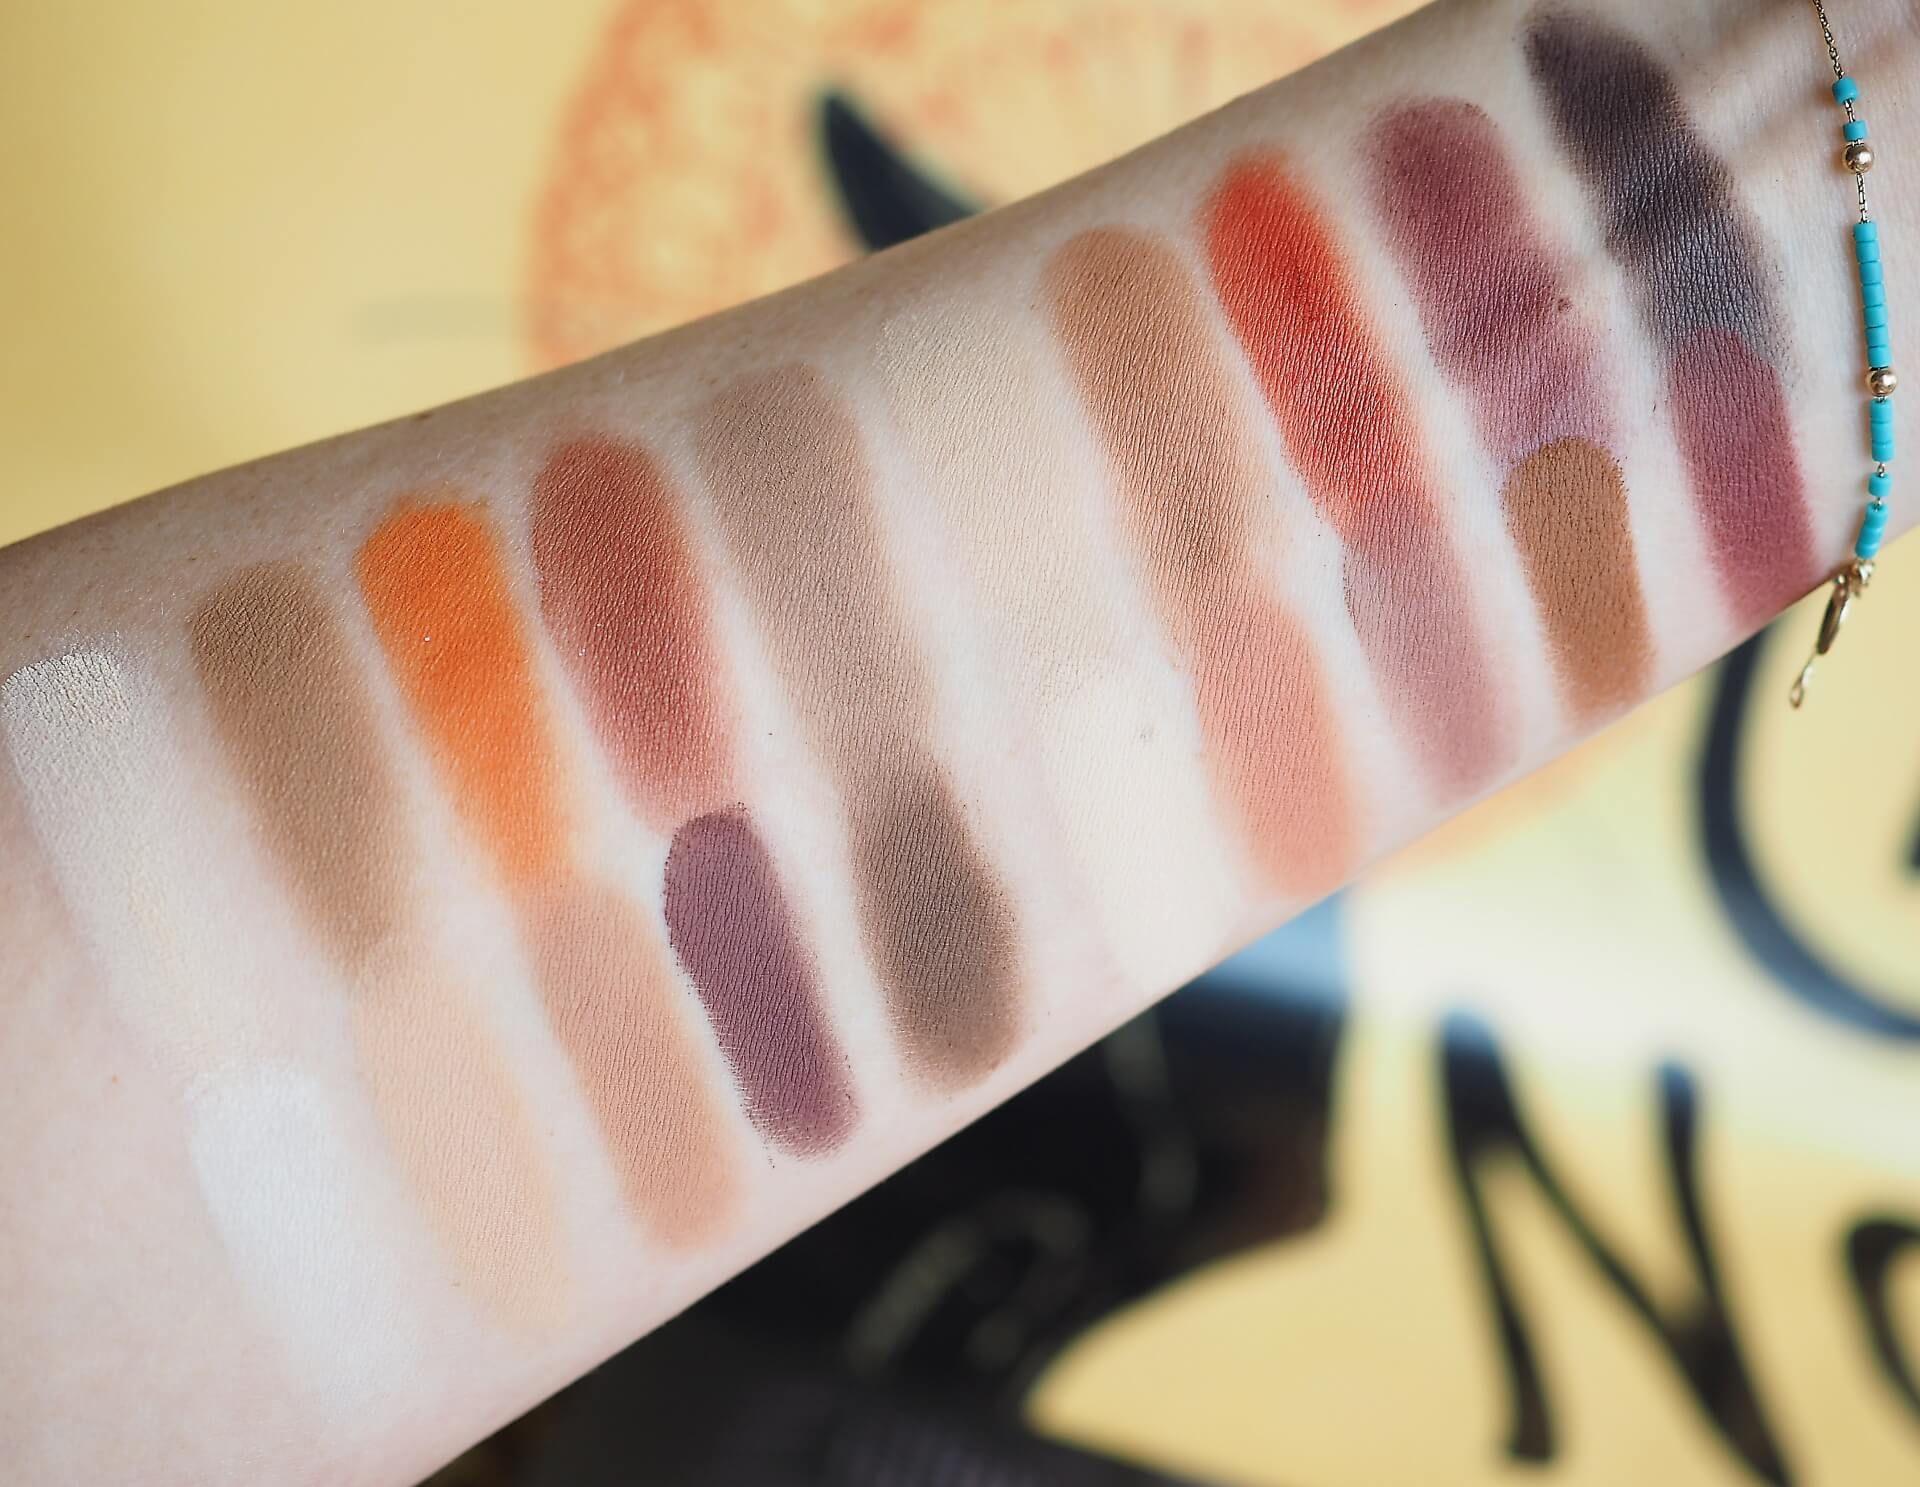 Zoeva Matte Eyeshadow Palette Recenzja Zdjecia I Swatches Delicious Beauty Eyeshadow Matte Eyeshadow Palette Matte Eyeshadow